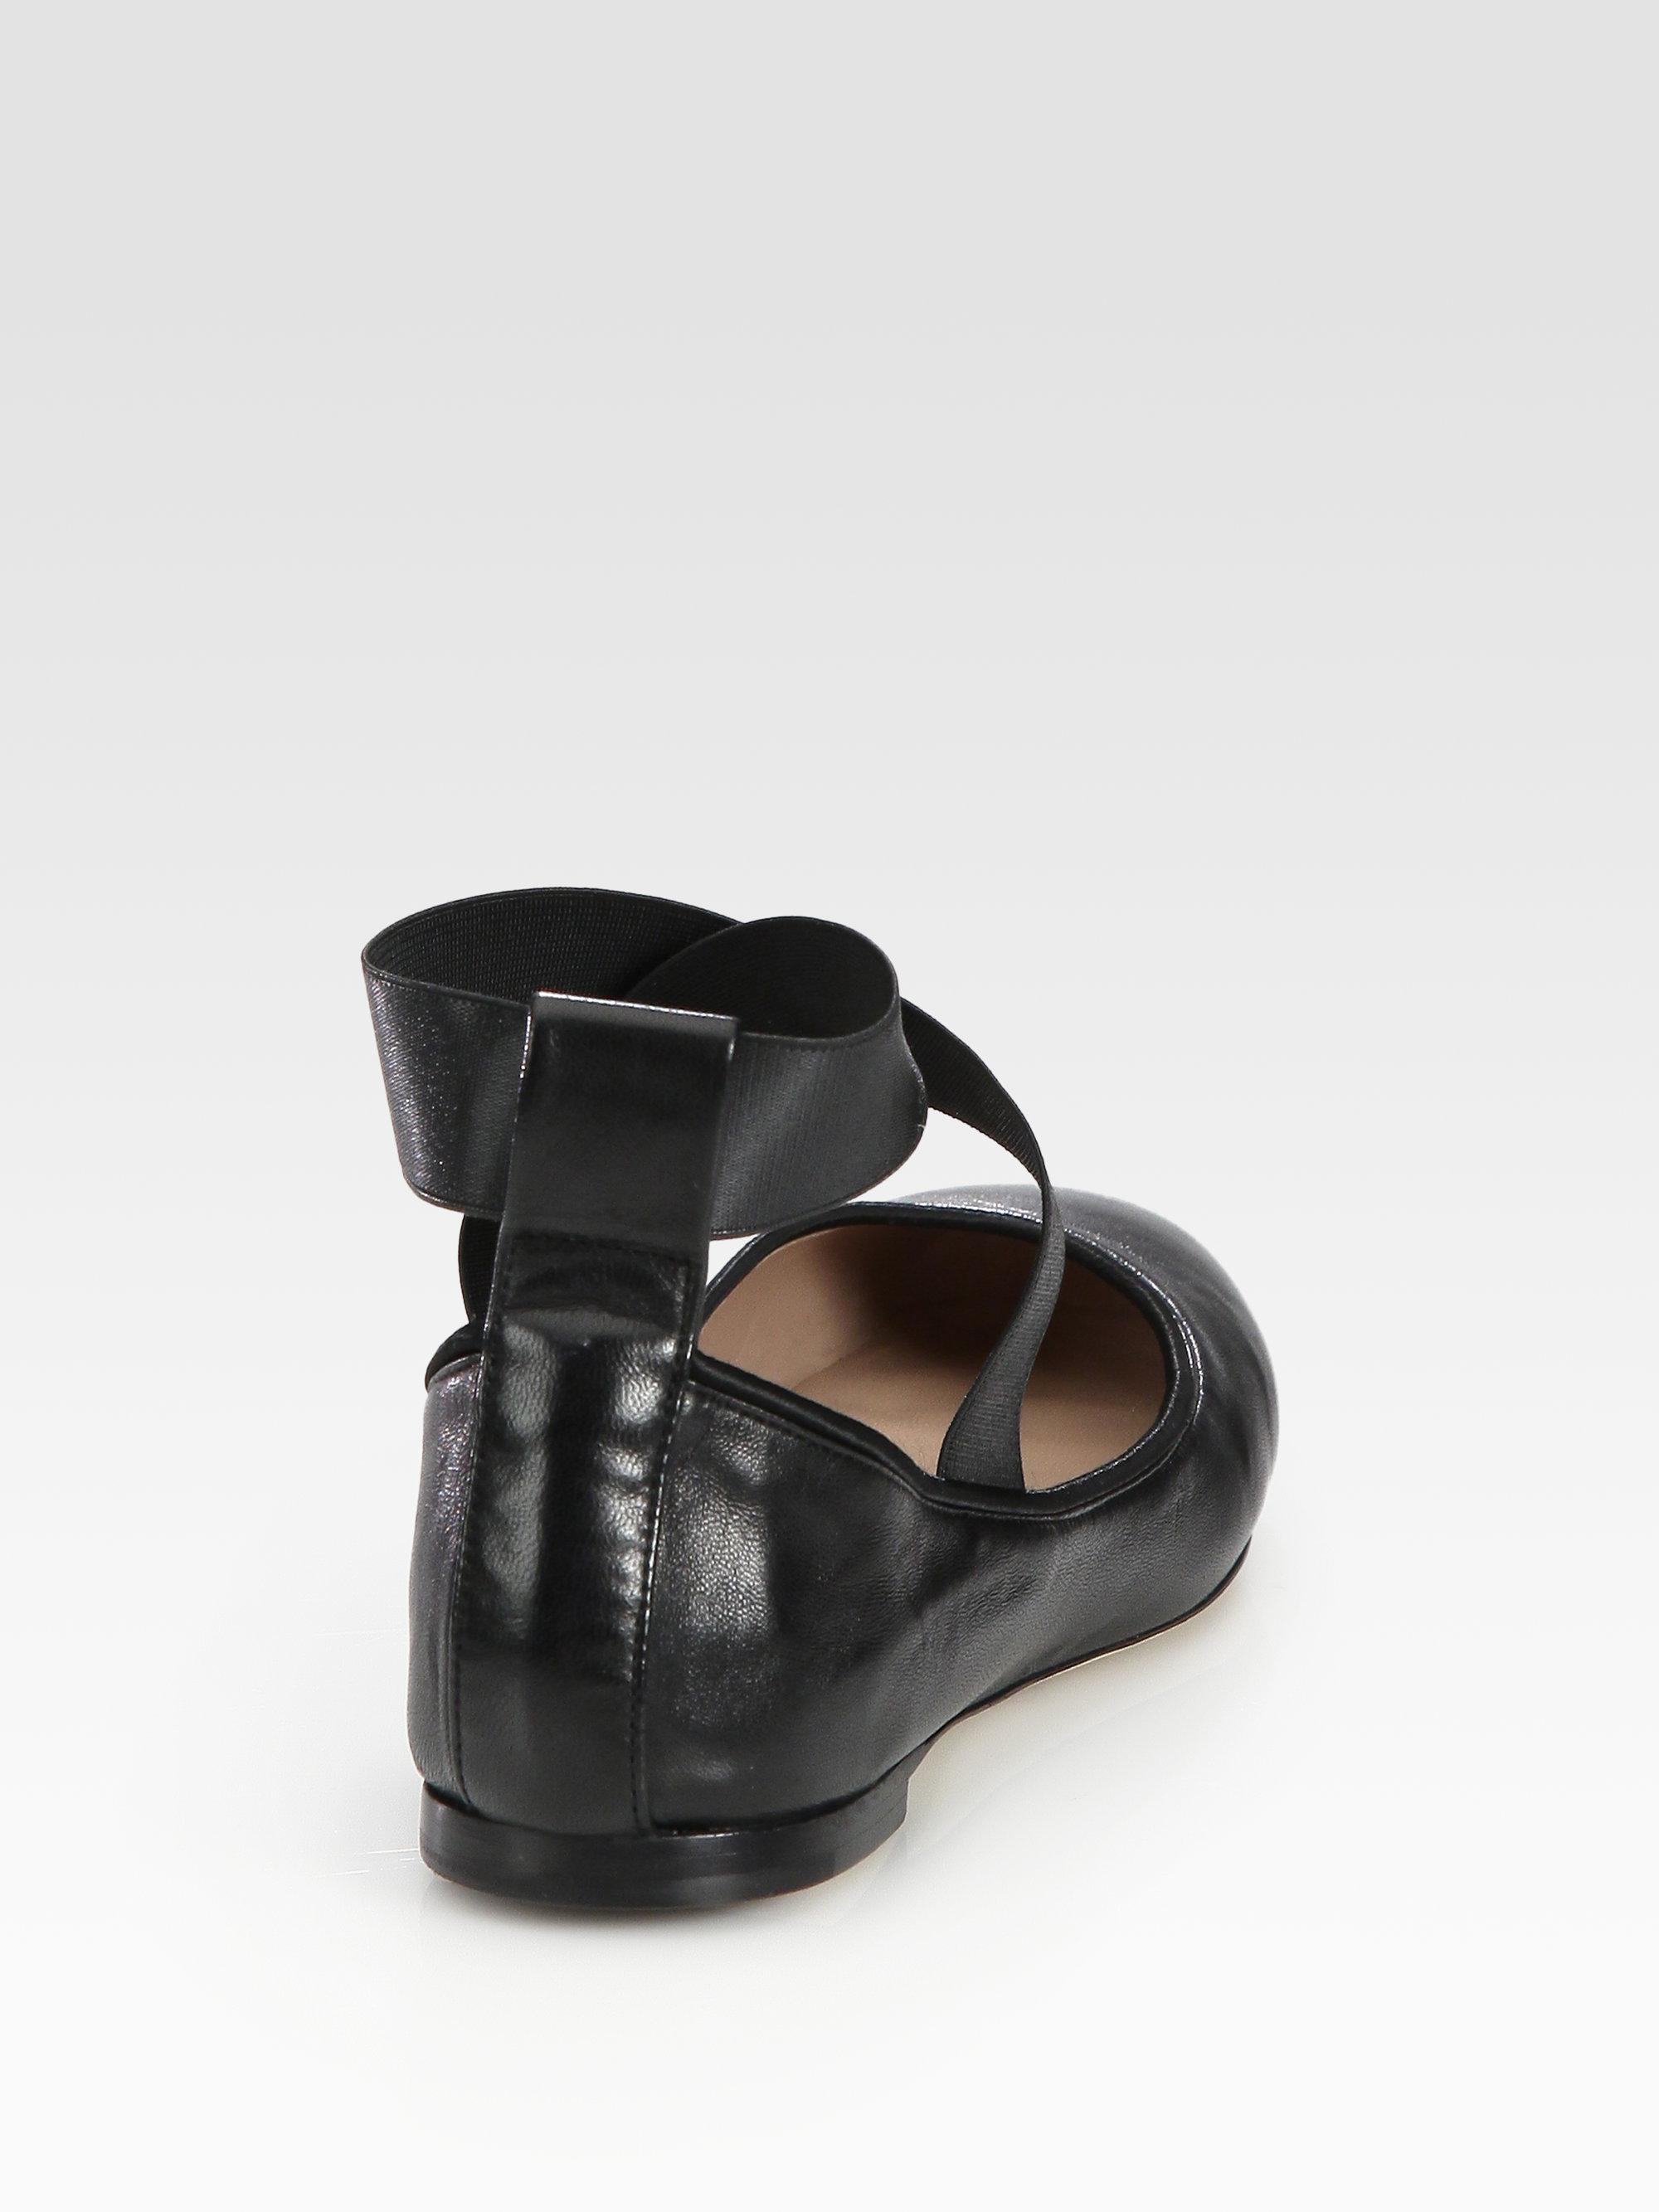 Chloé Leather Square-Toe Flats sale footlocker f376Zk8AF